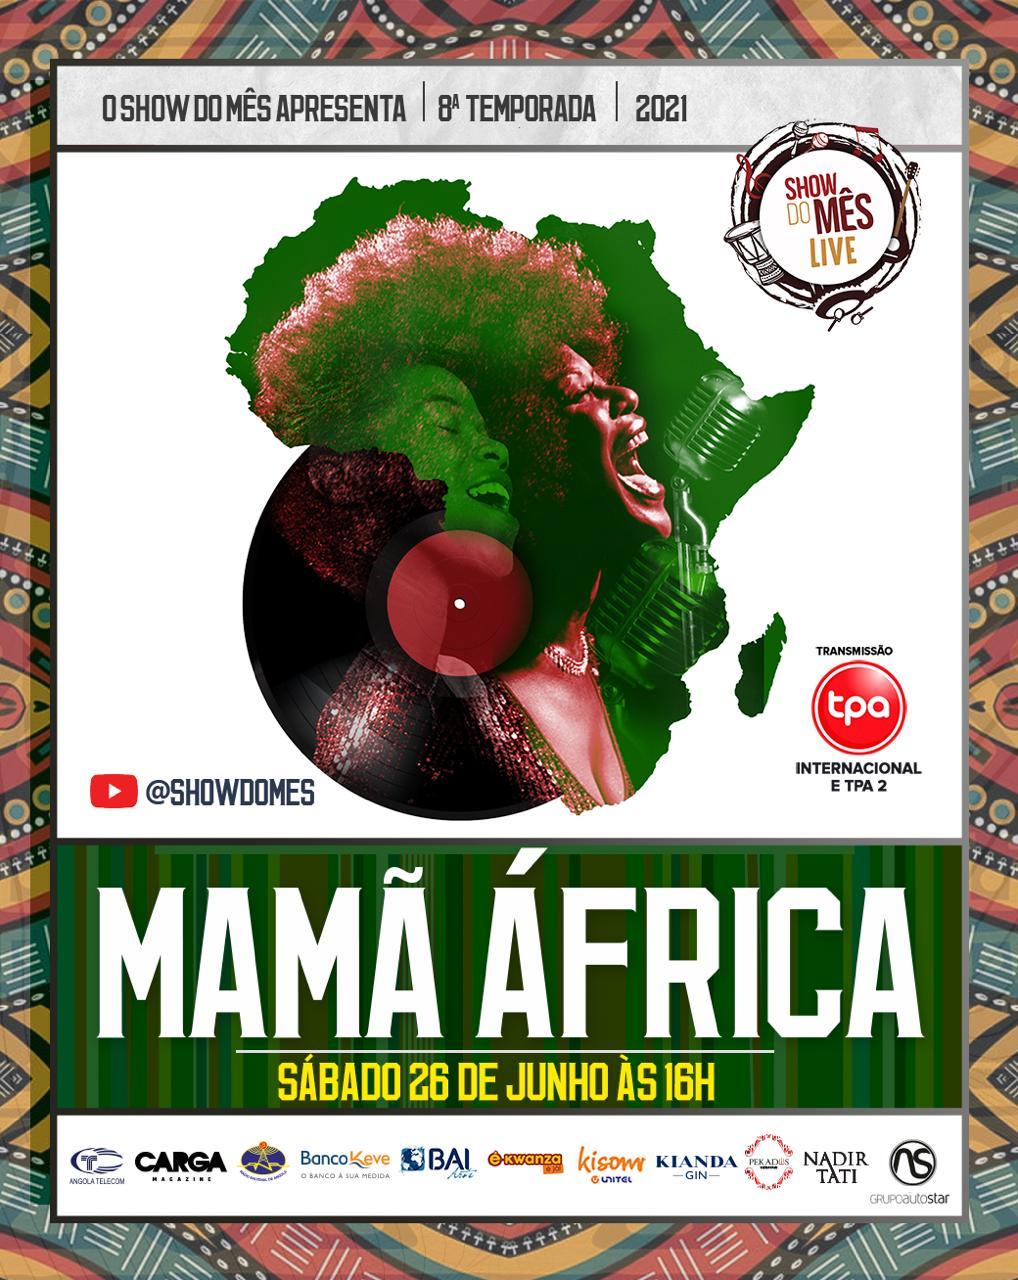 Próximo Show do mês celebra Mamã África